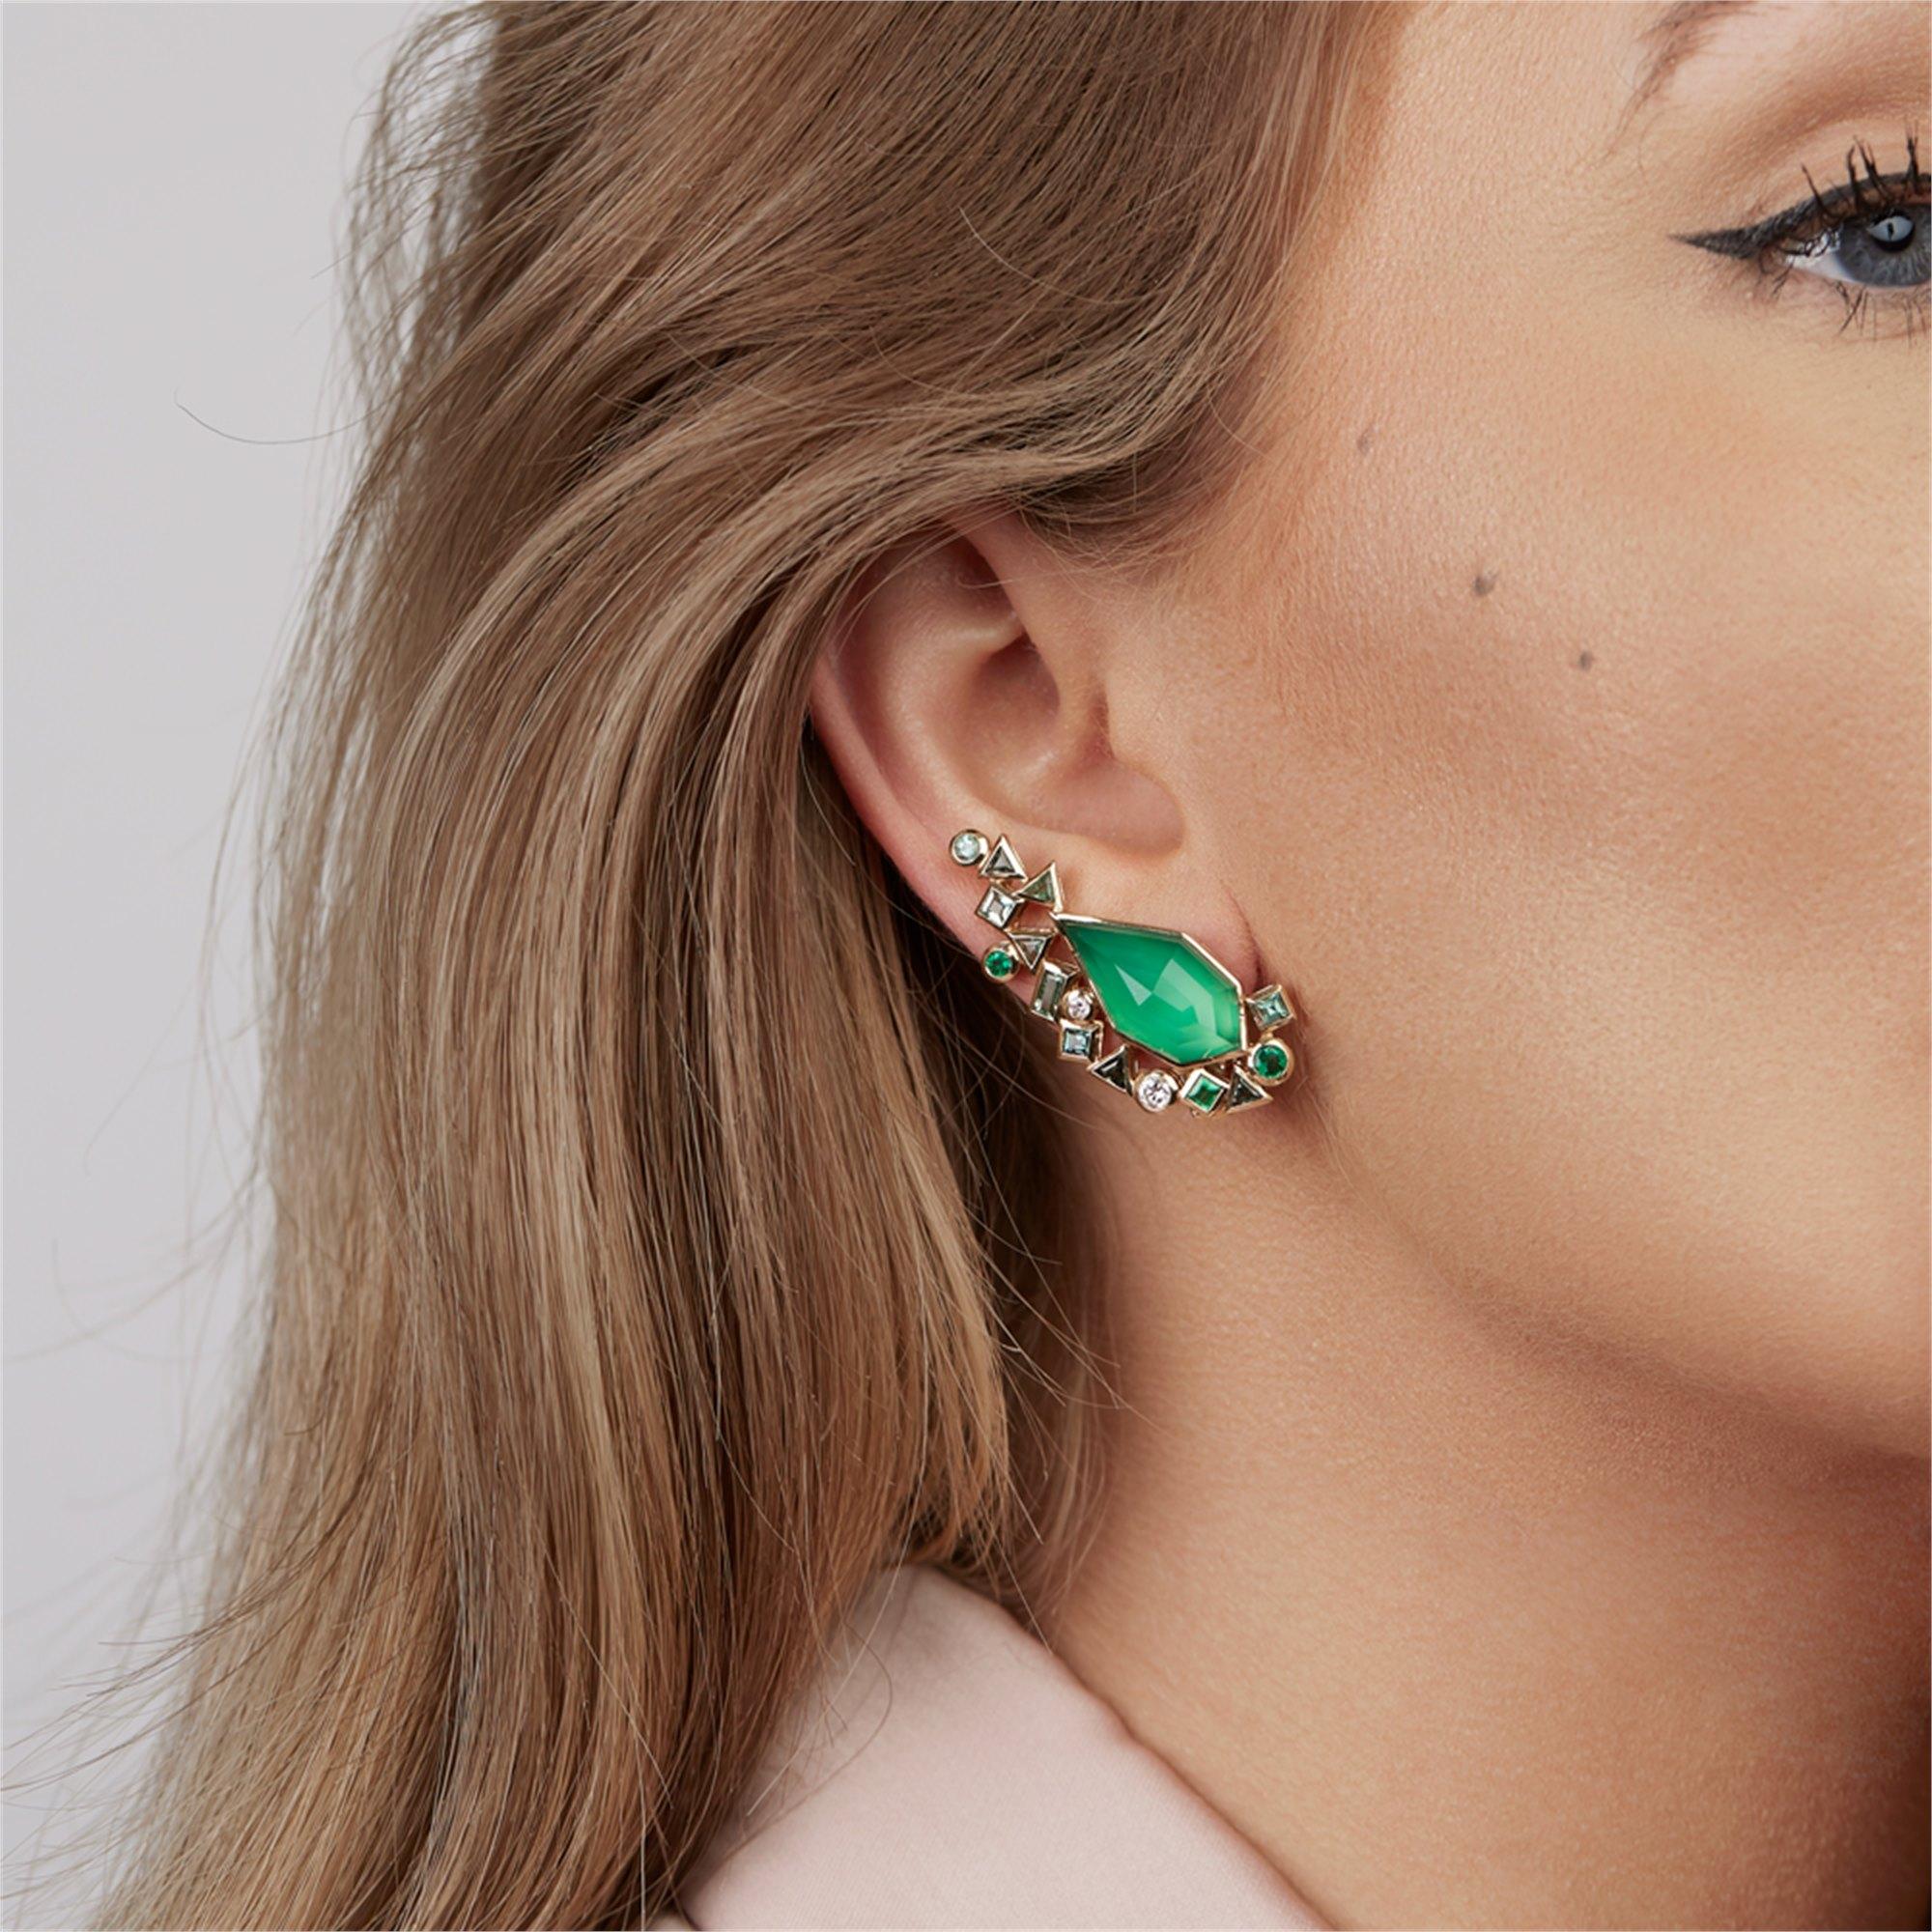 Stephen Webster 18k Yellow Gold Crystal Haze Gold Struck Green Agate Earrings